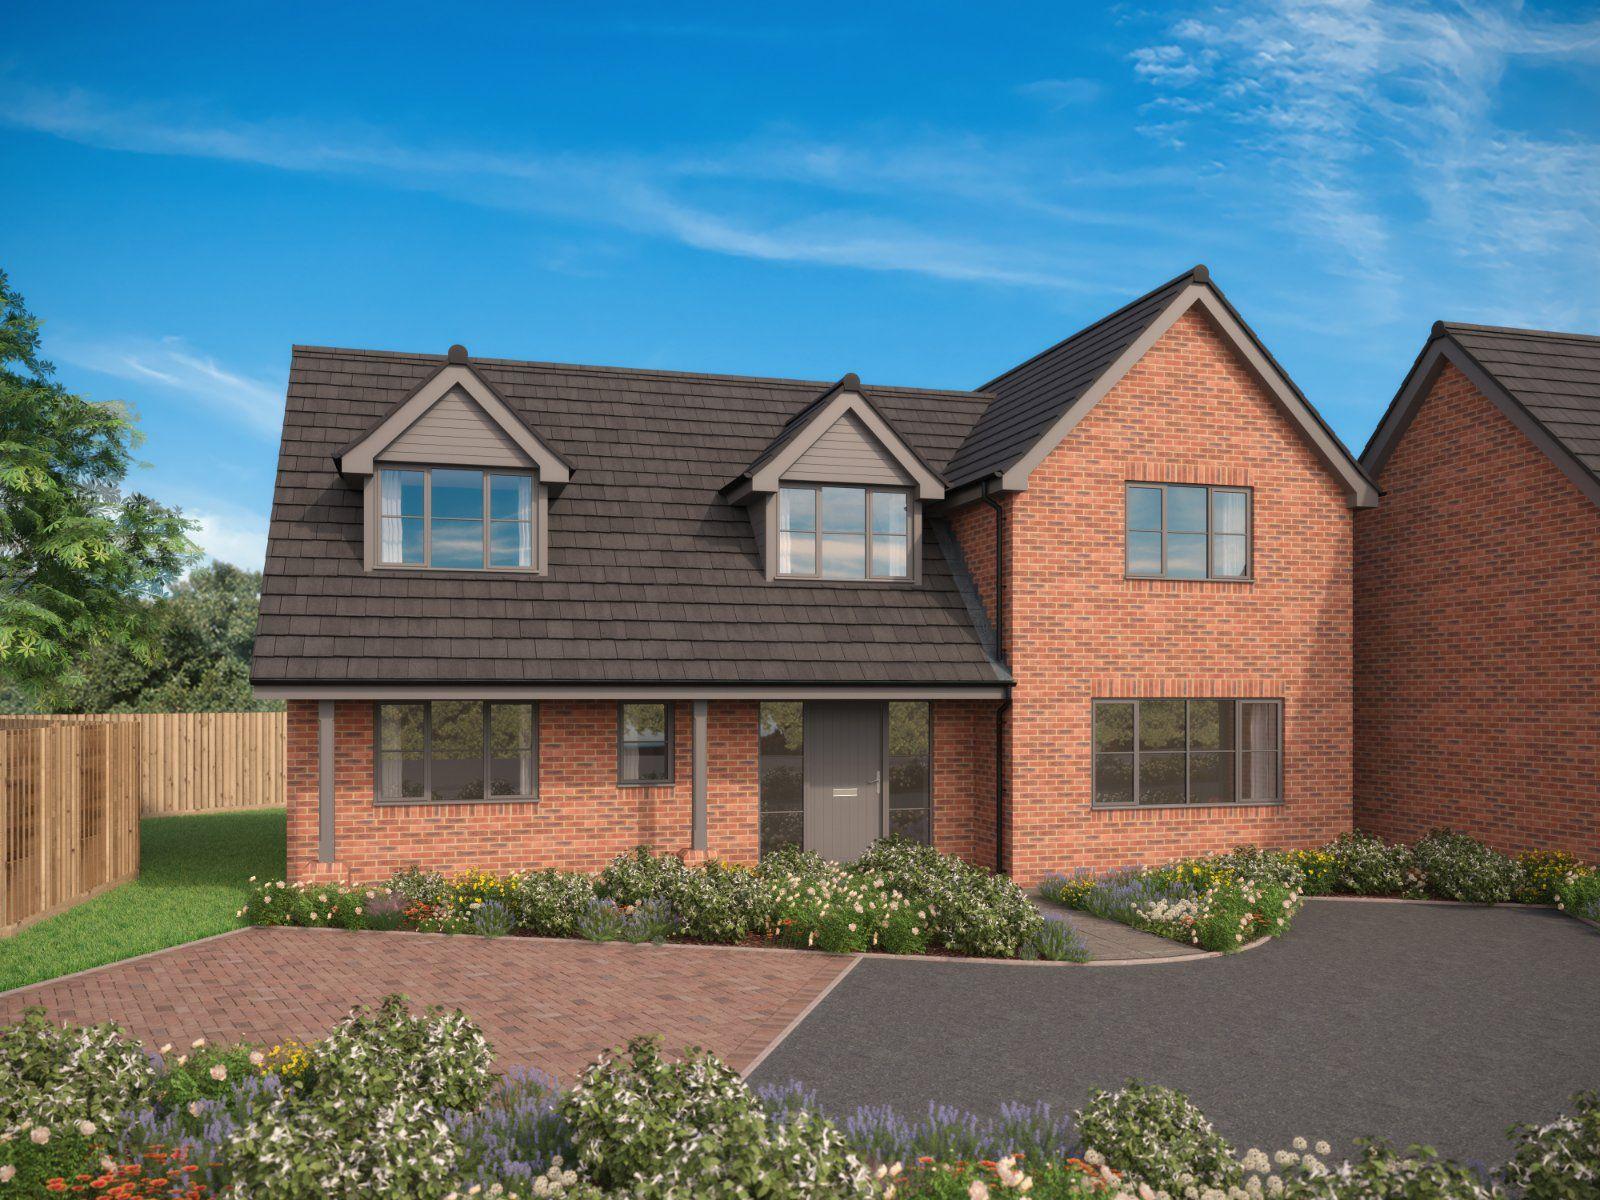 Property photo 1 of 2. Main